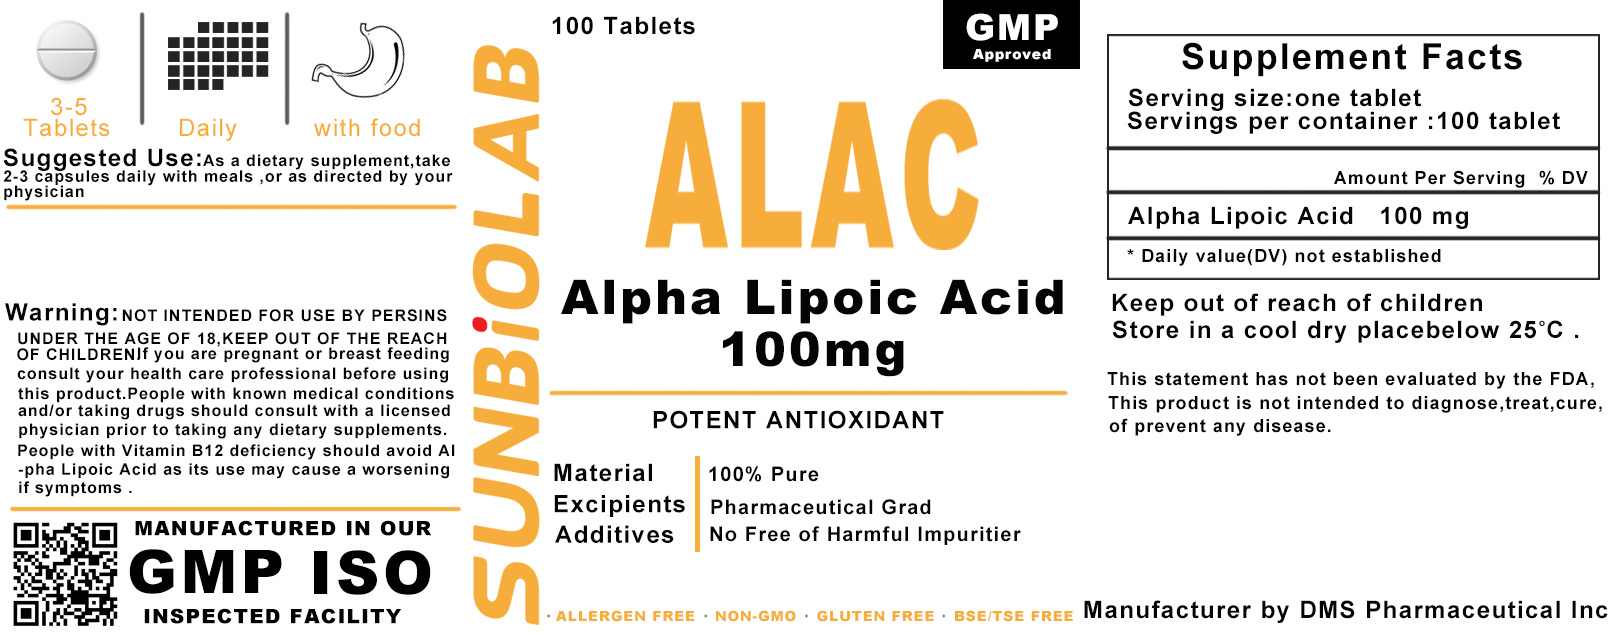 Thioctic Acid (Lipoic Acid) Tablet 100mg GMP Factory